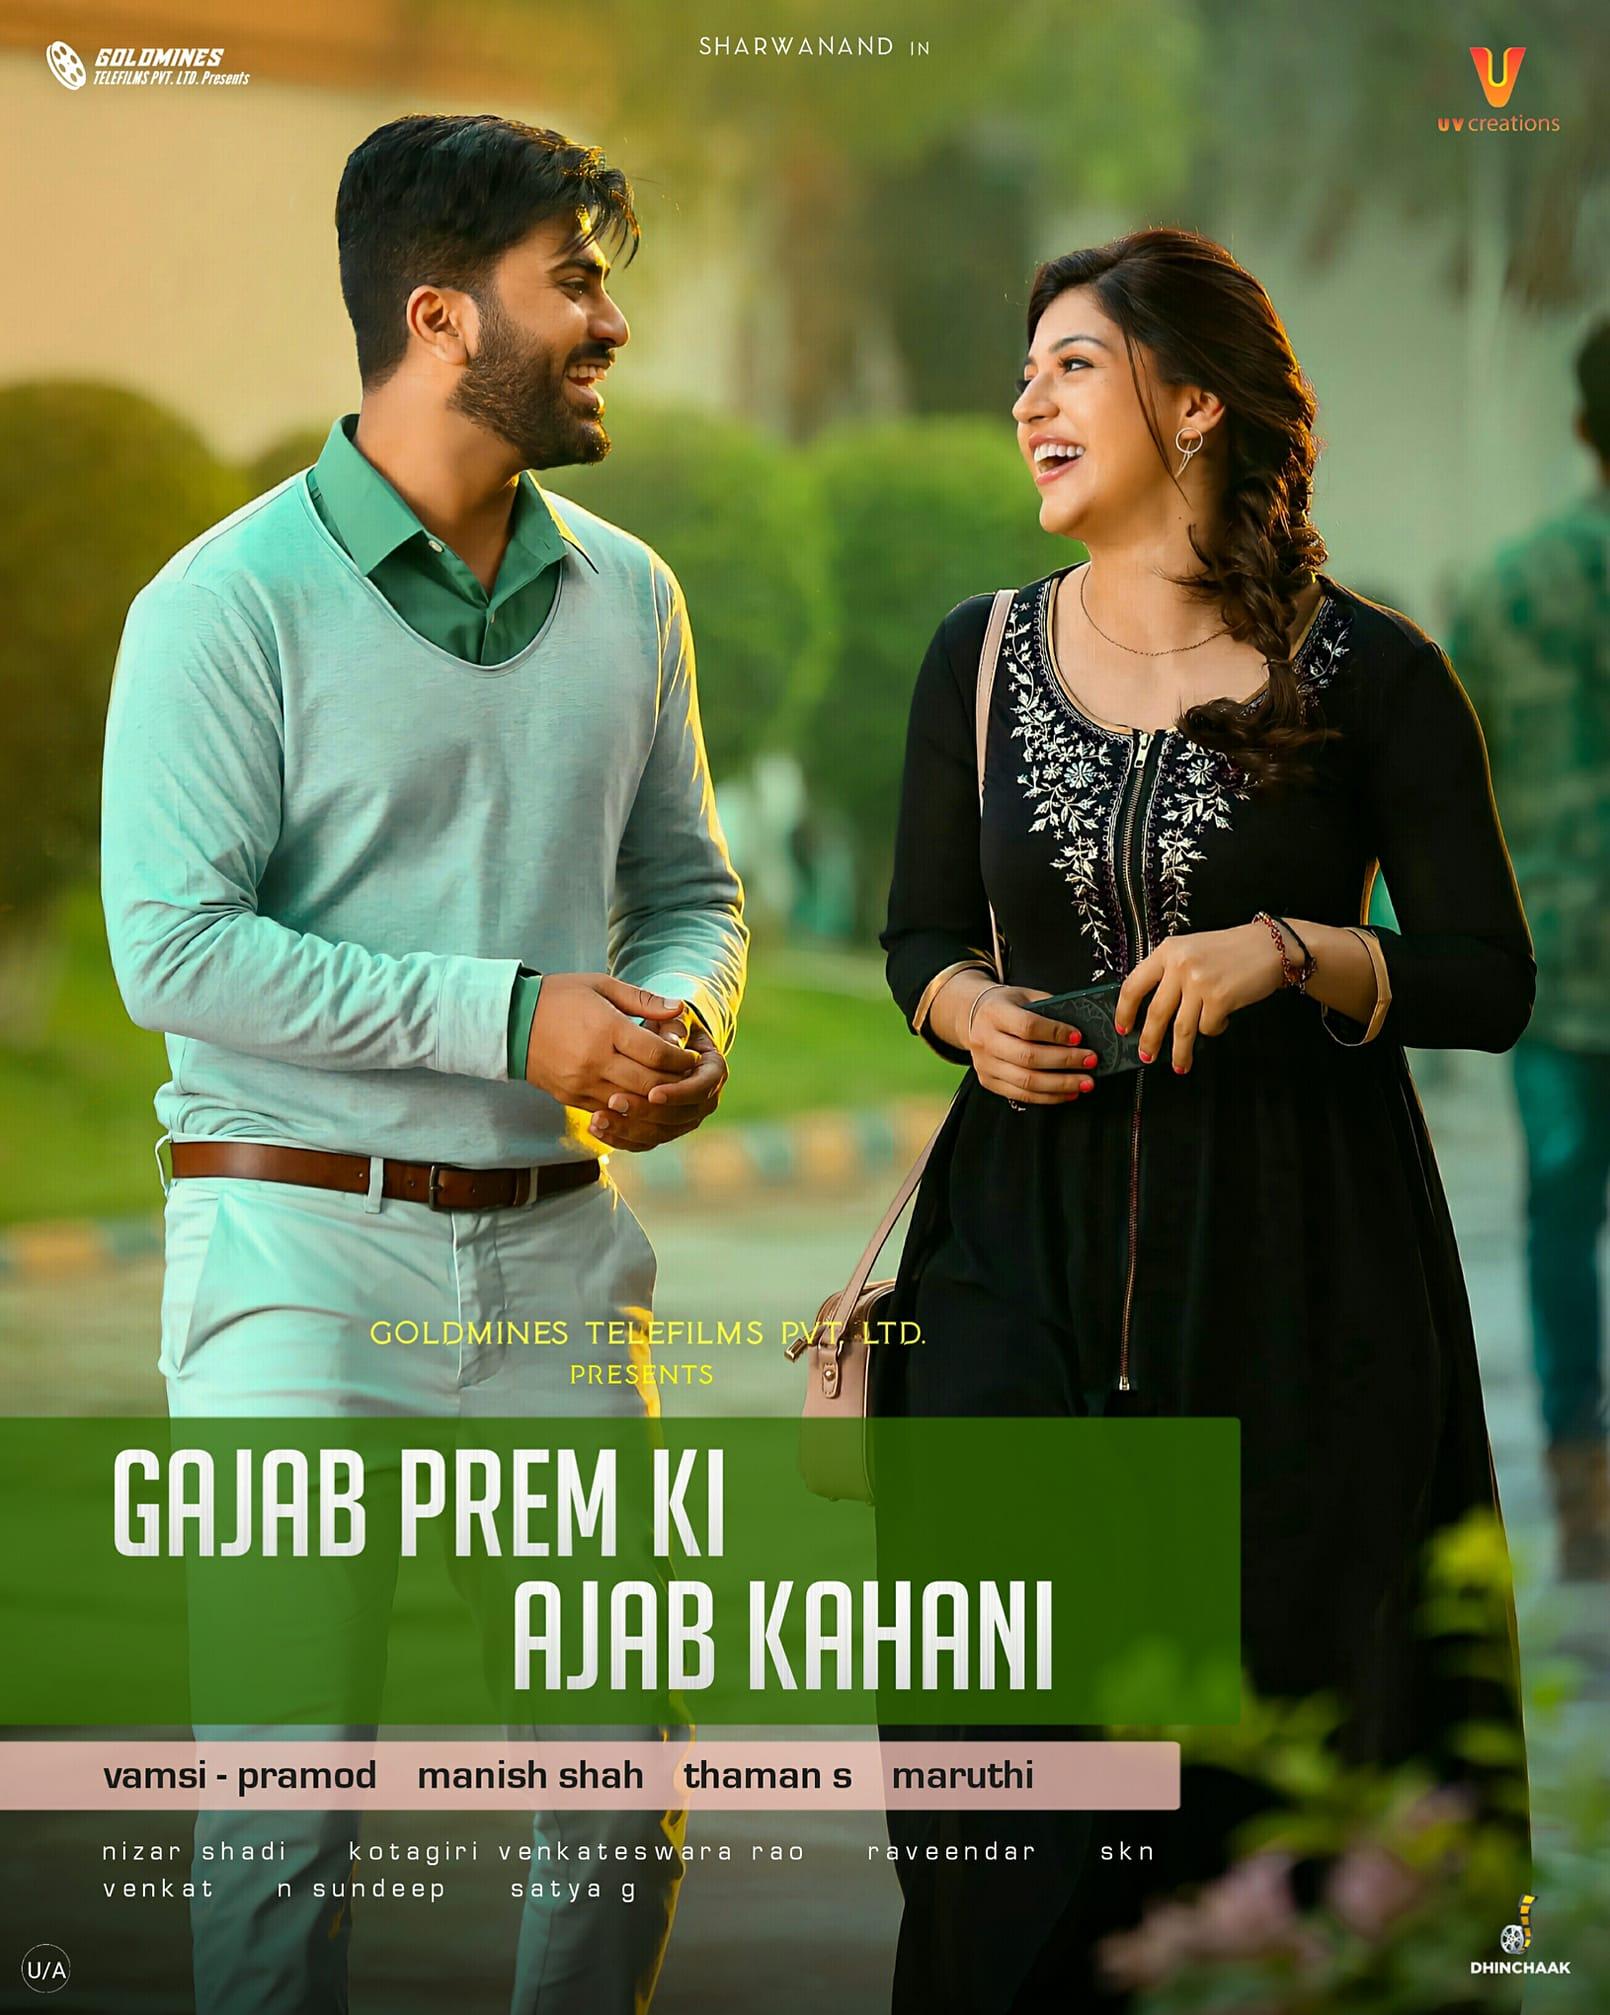 Gajab Prem Ki Ajab Kahani (2021) Hindi Dubbed 720p HDRip 850MB Download